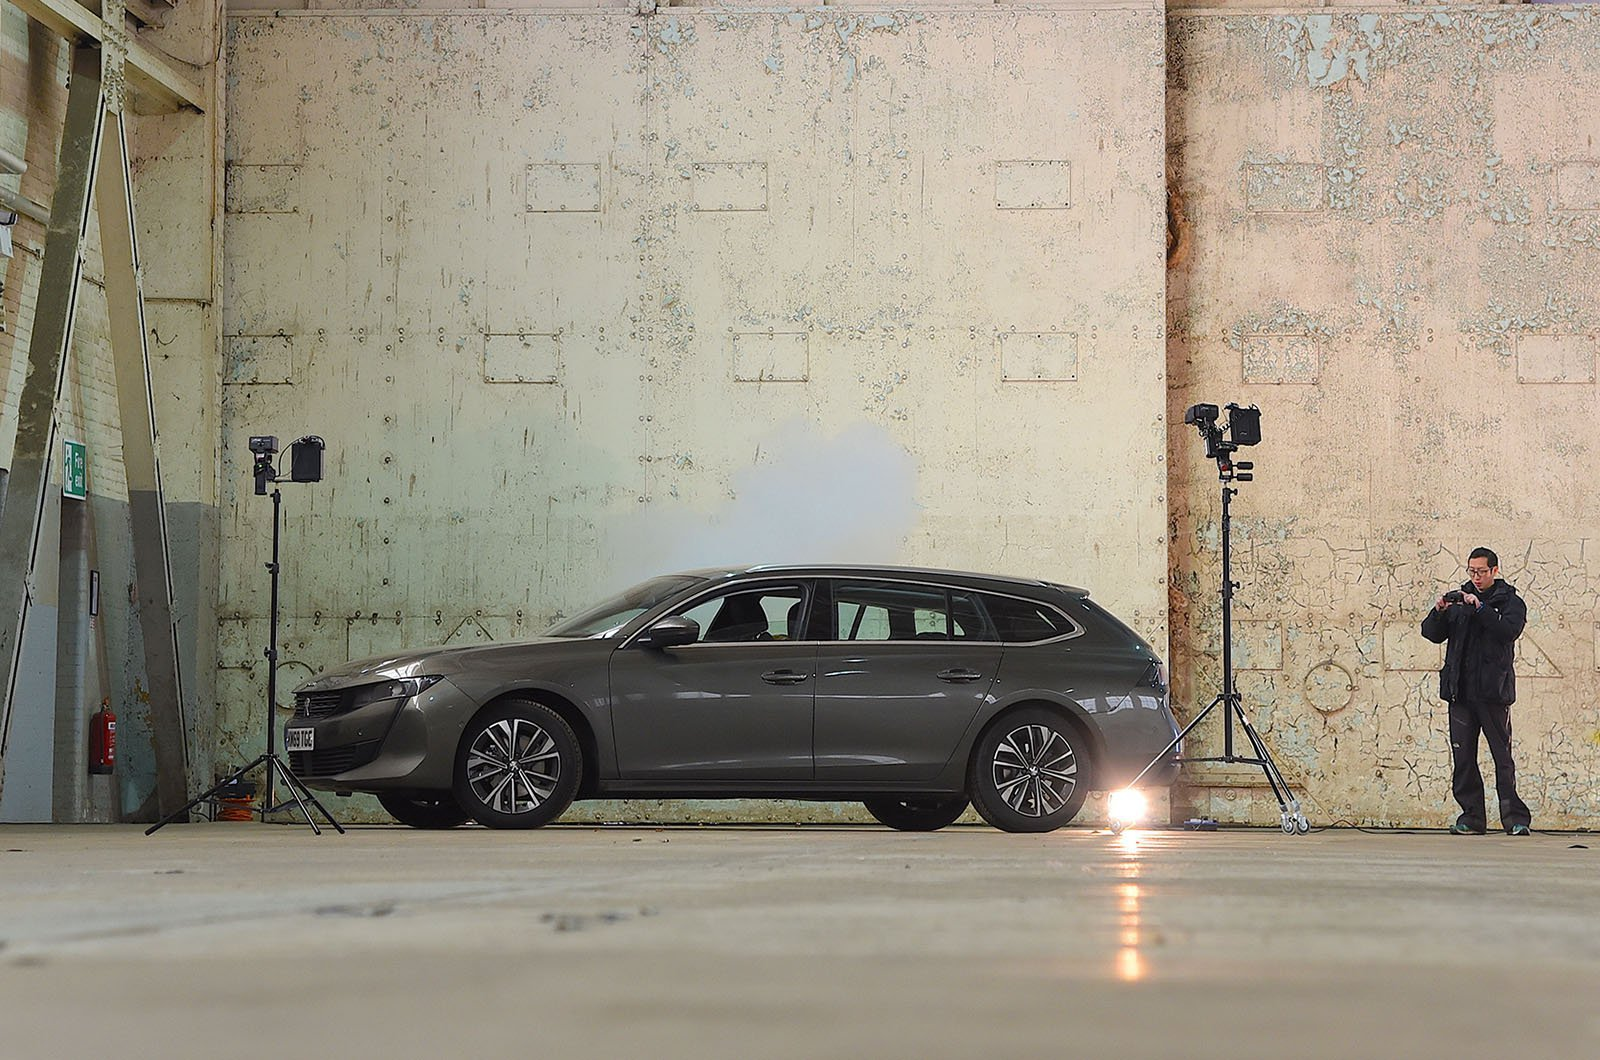 Peugeot 508 SW long-term review: report 2